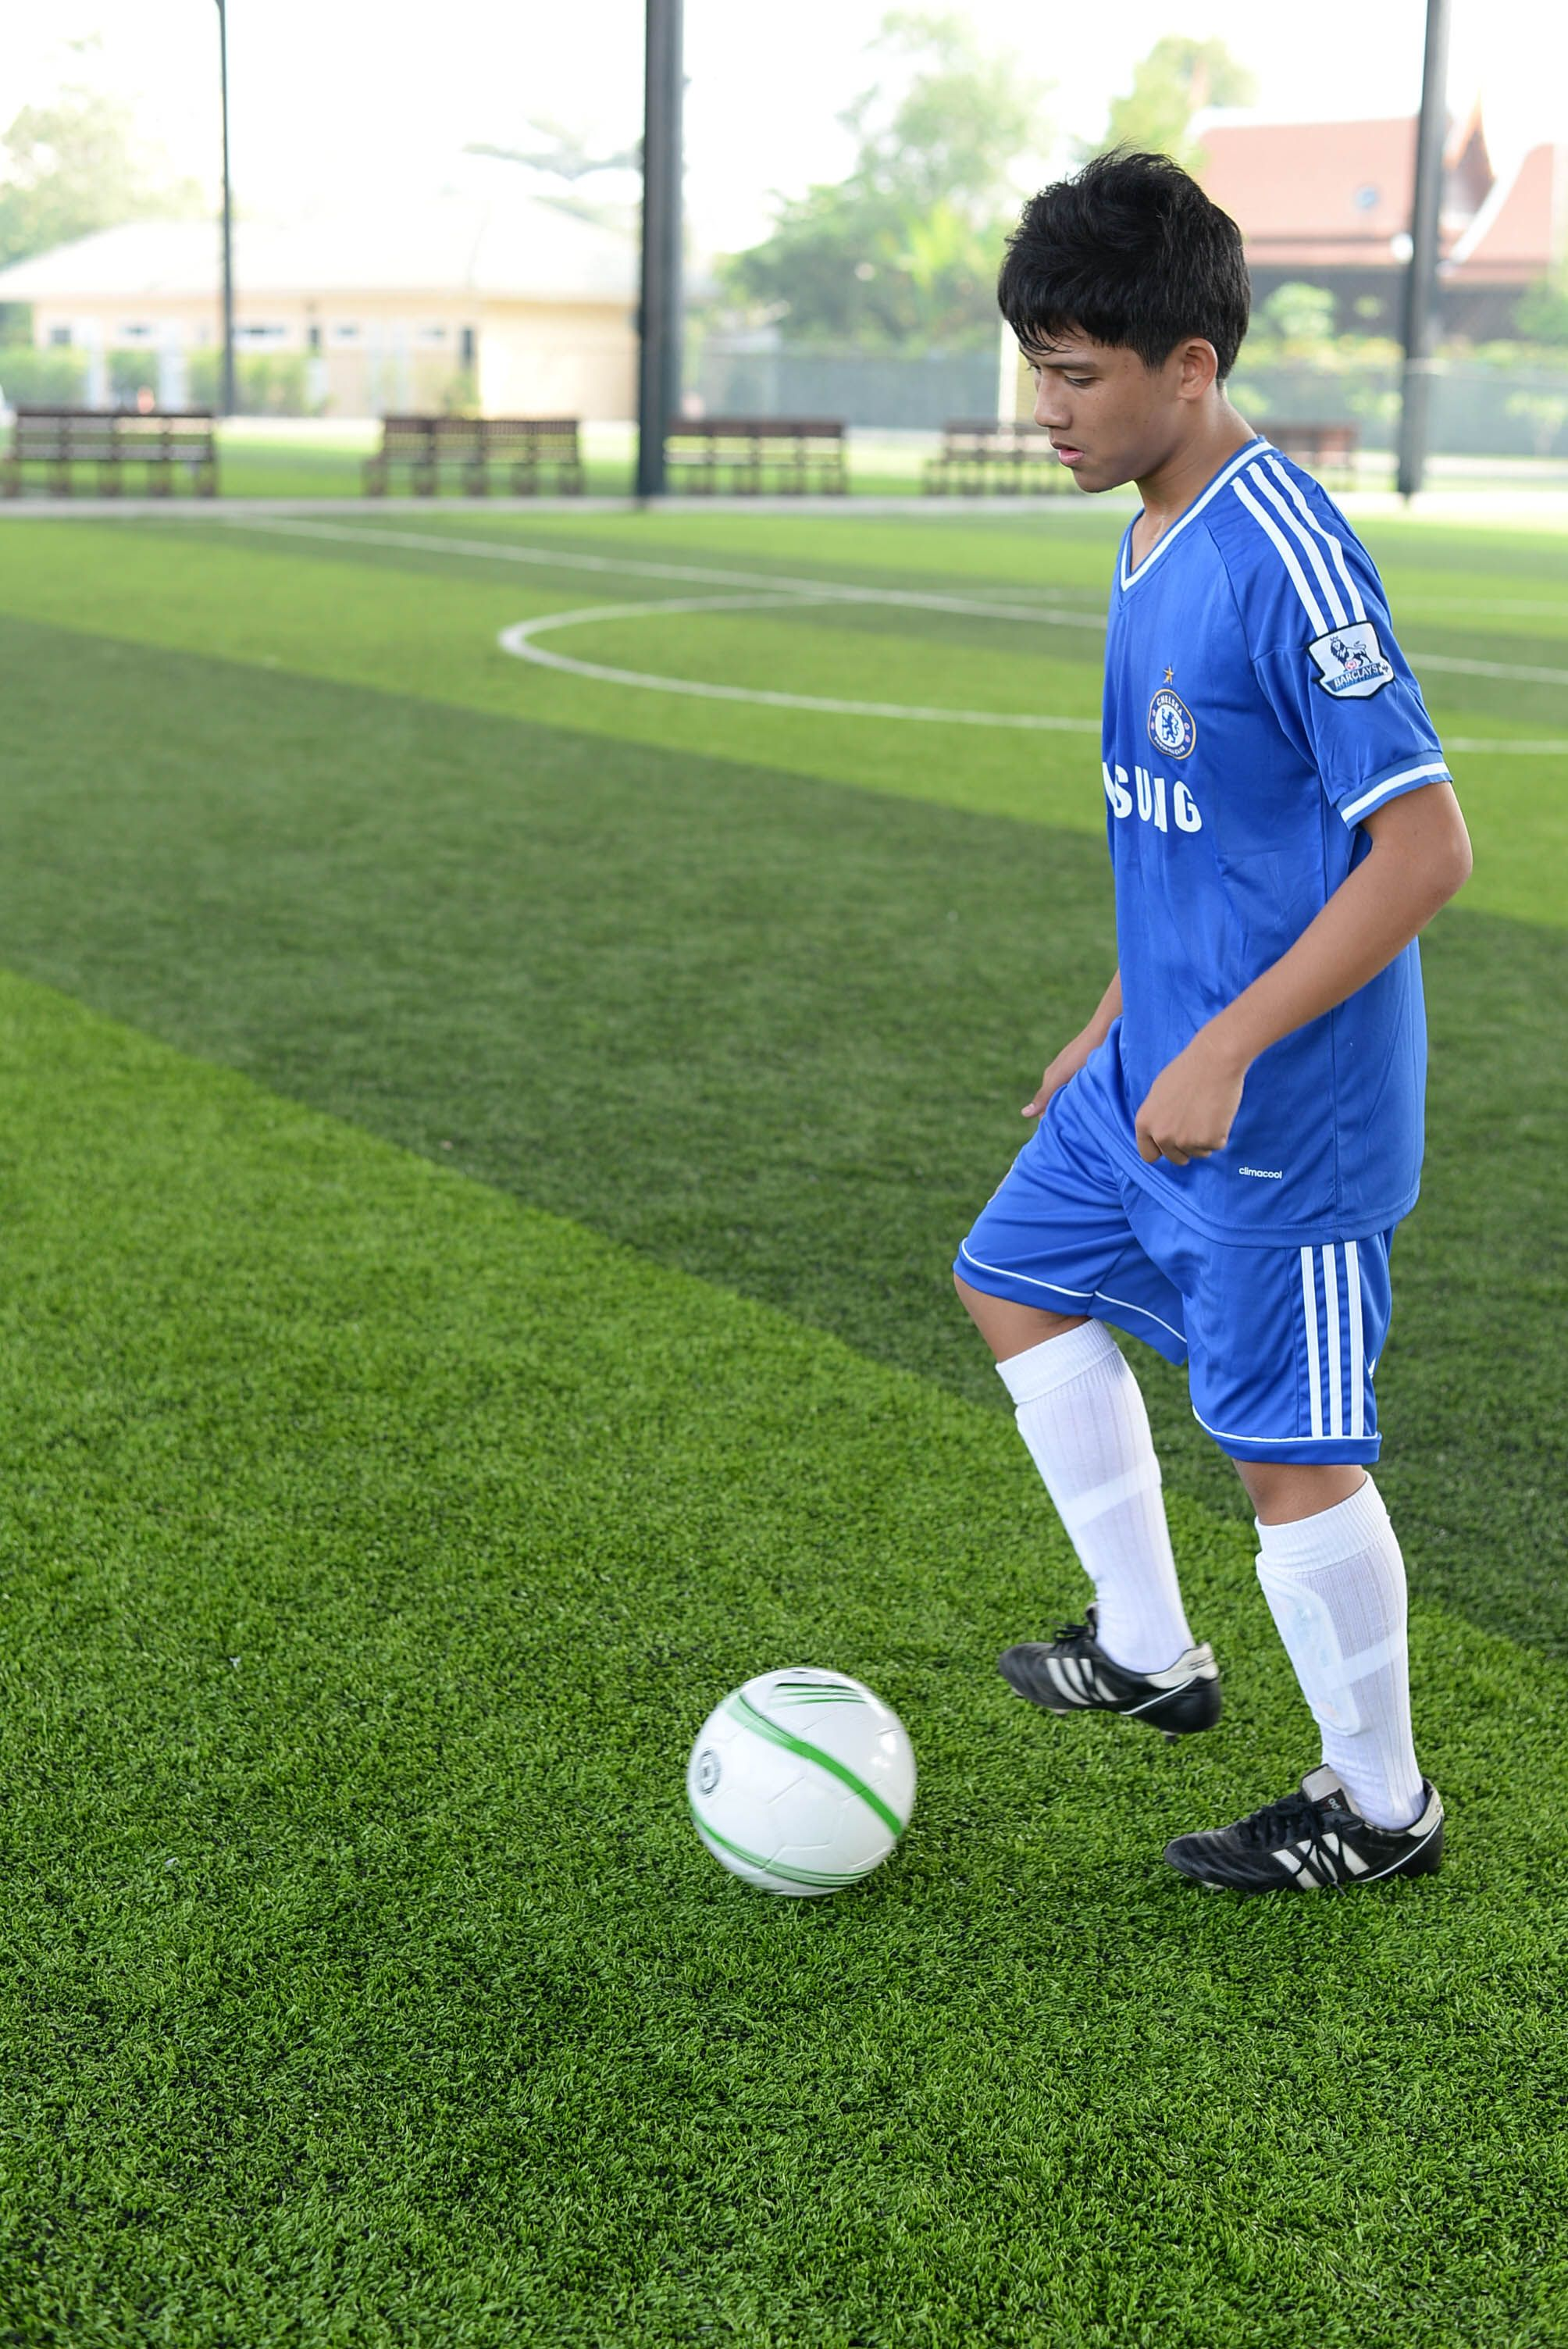 ball control tips, skills, soccer - Soccer Conditioning